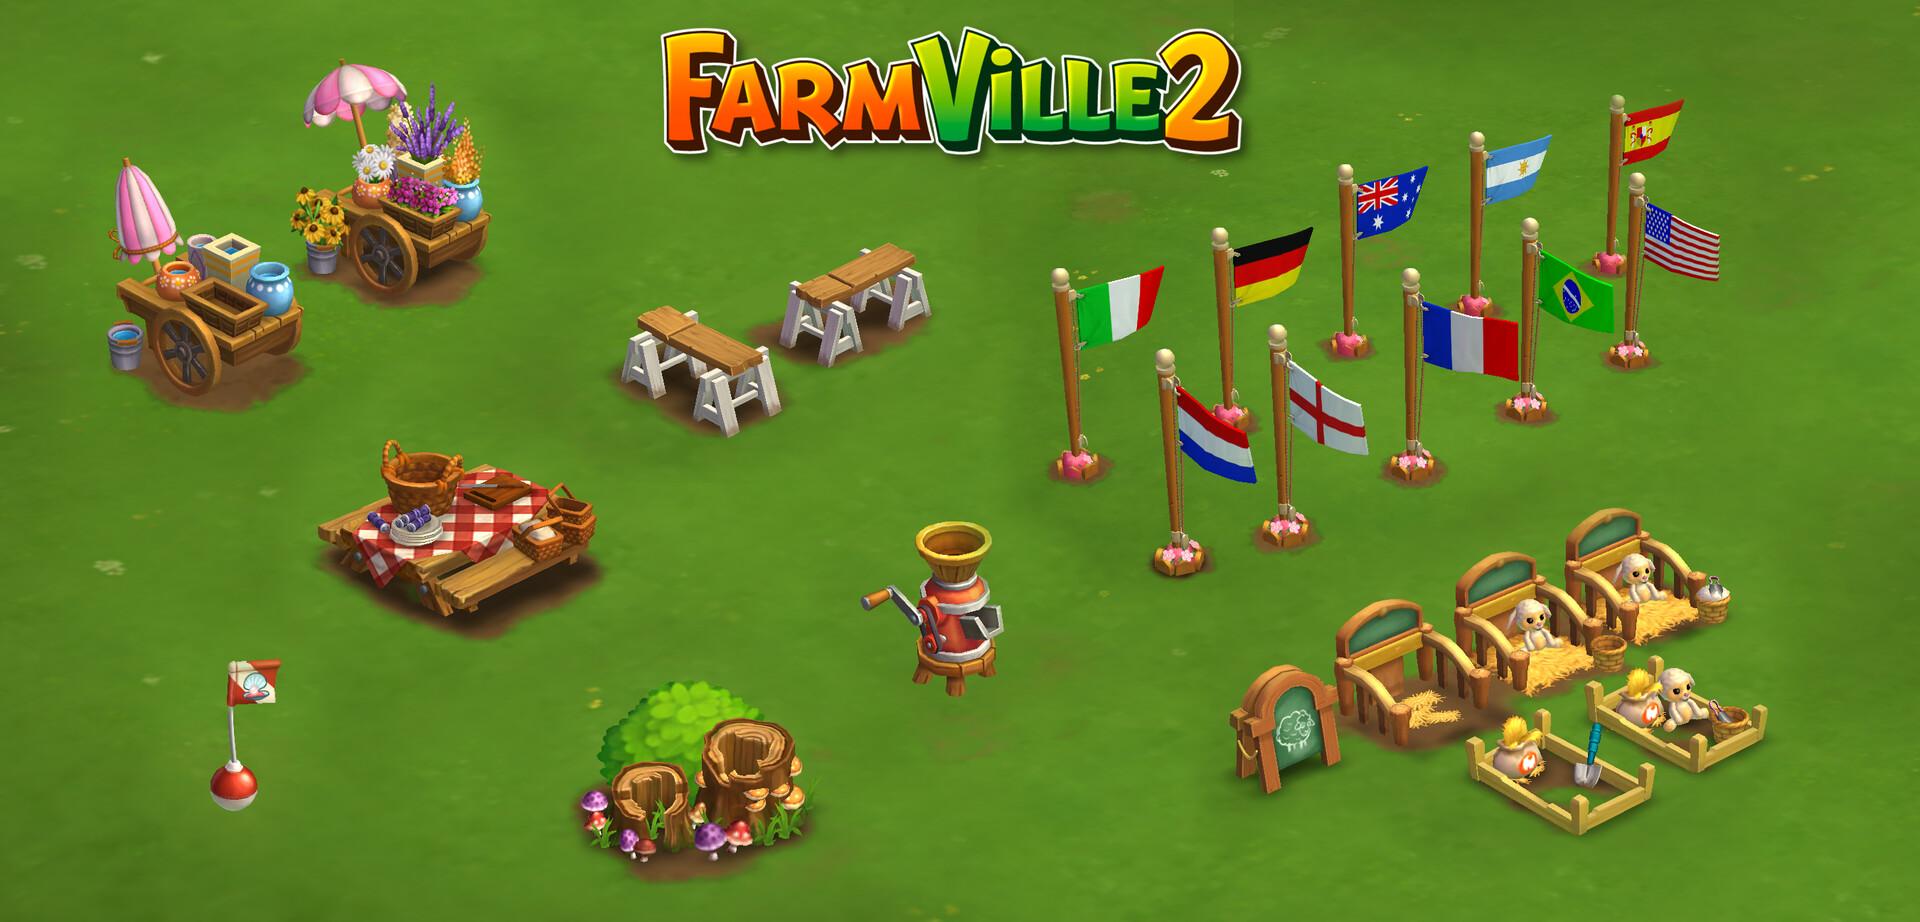 Farmville 2 Props